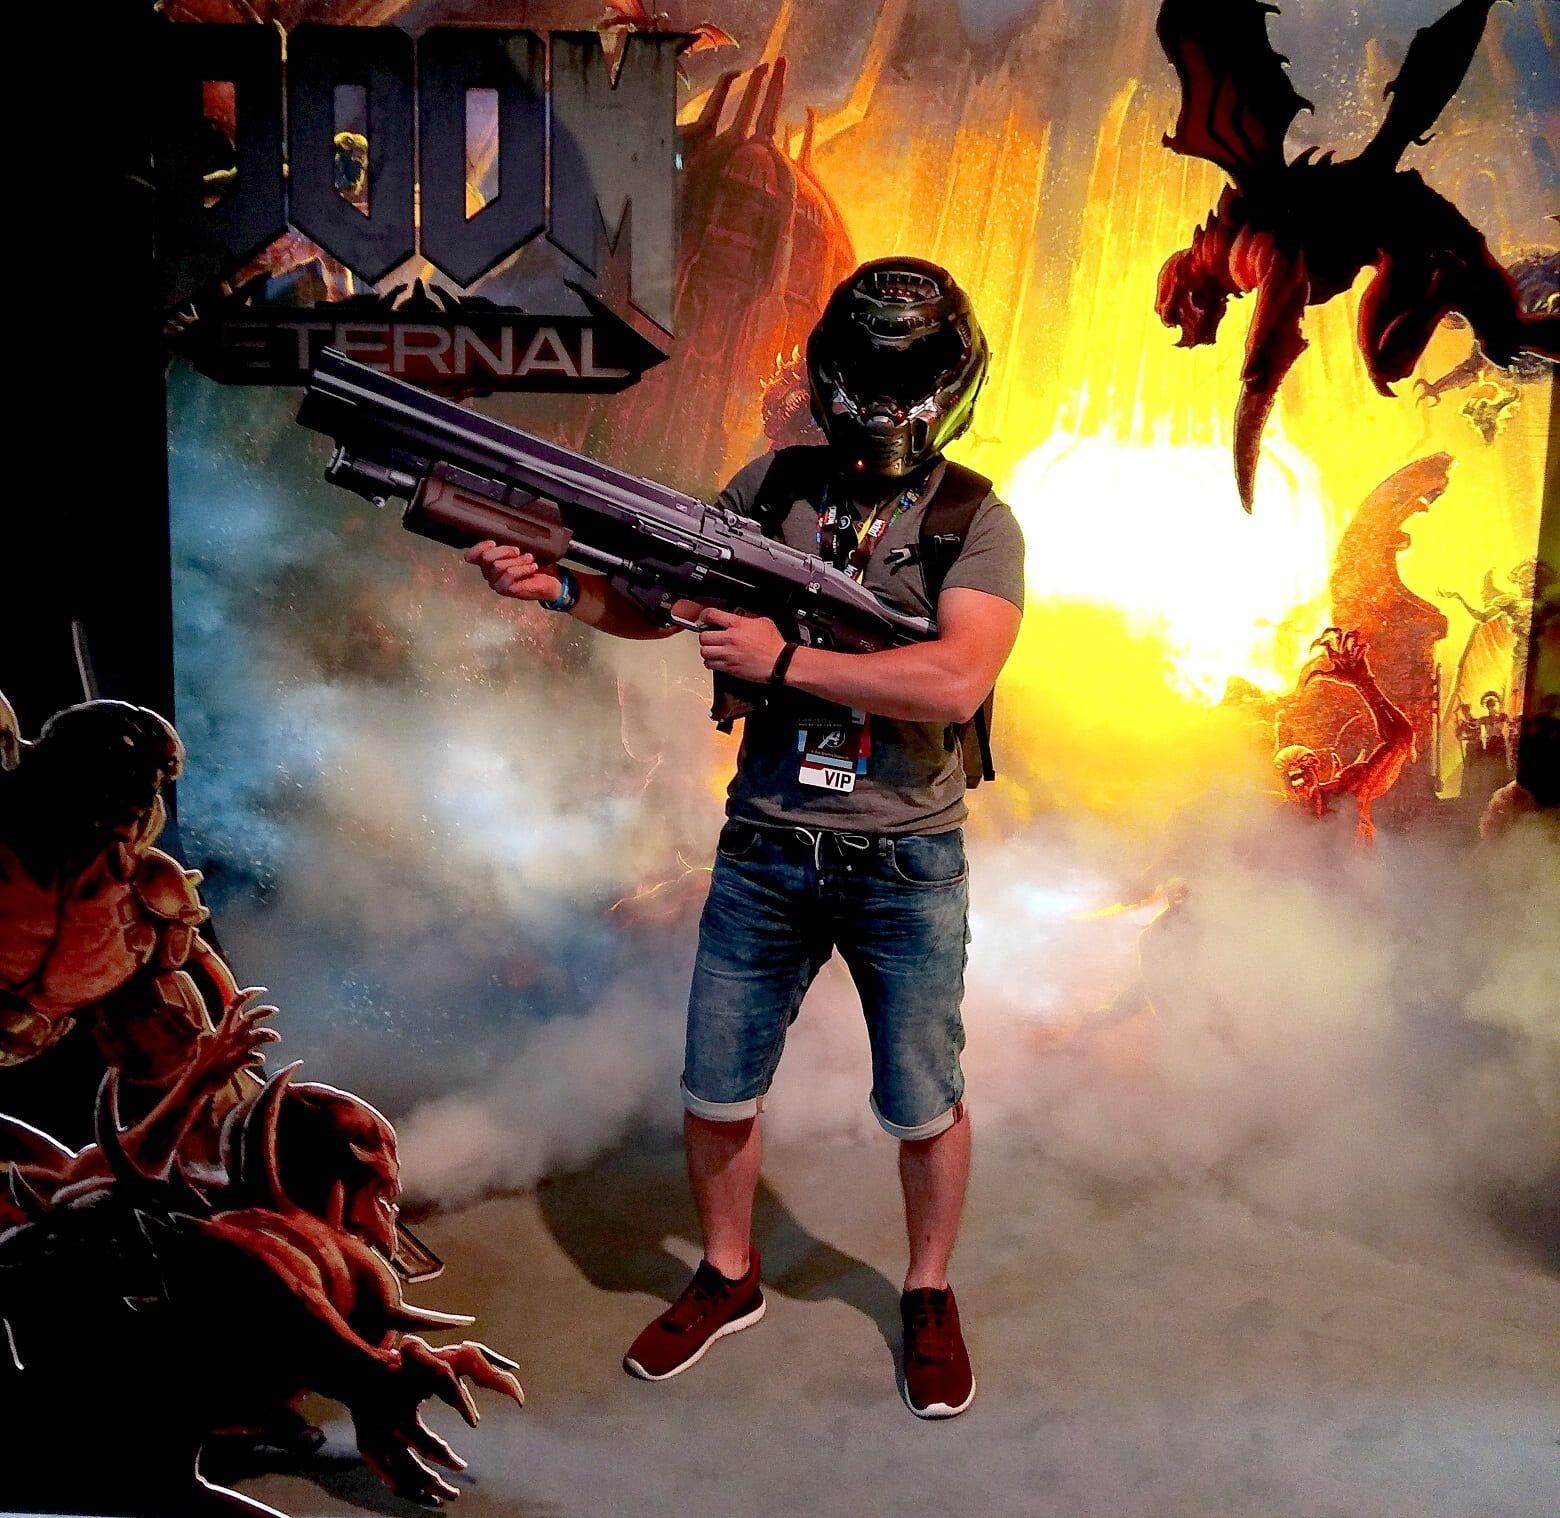 Gamescom 2019, Filip Němec the Doomguy